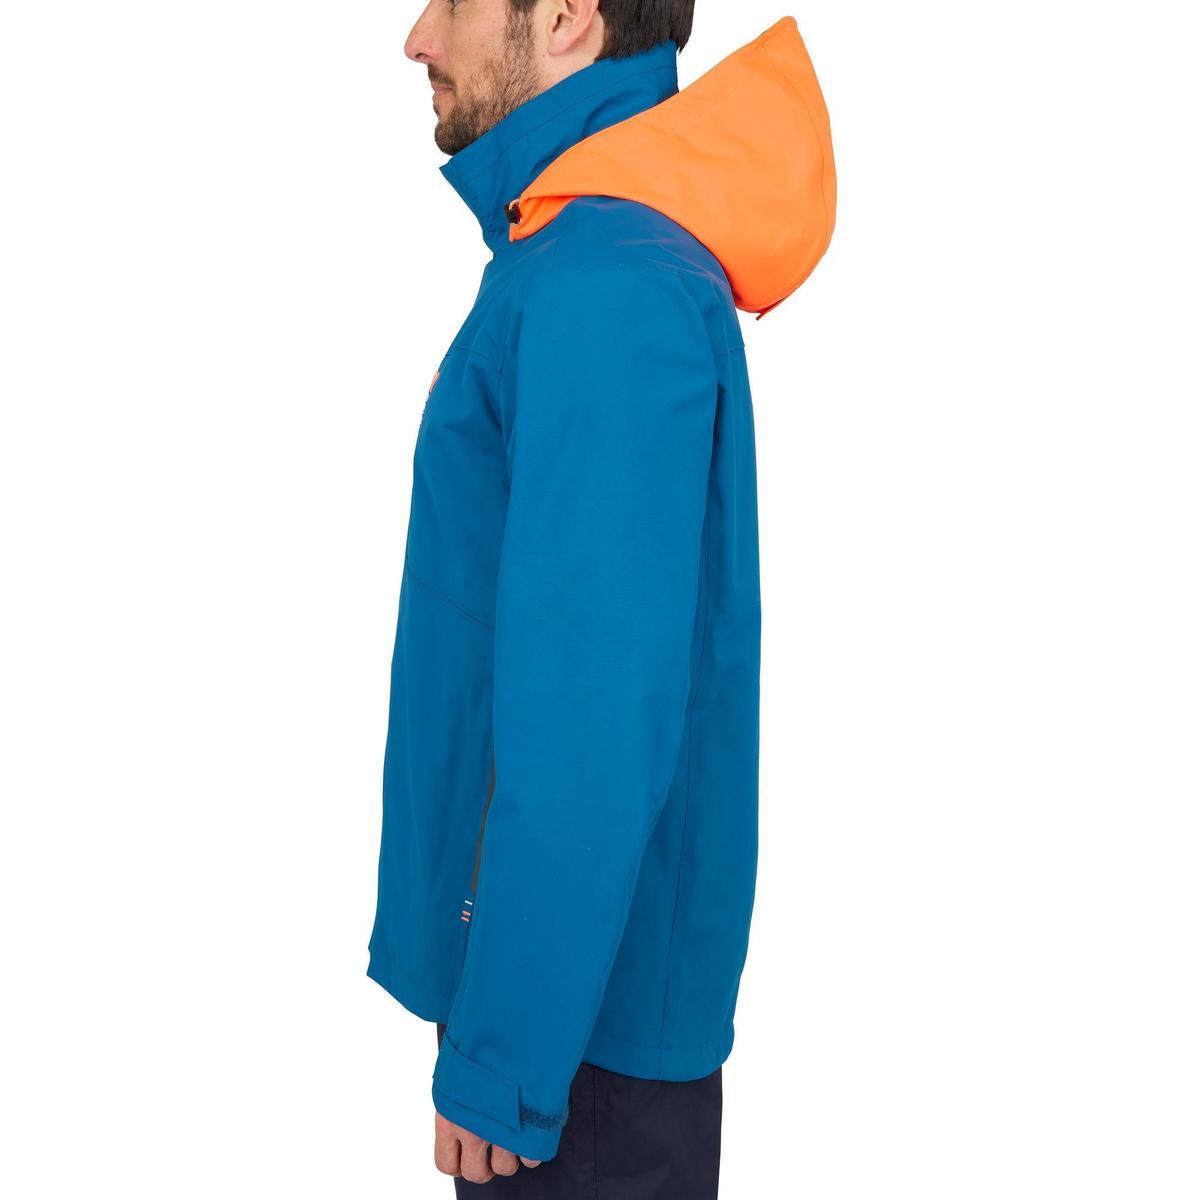 Bild 4 von Segeljacke wasserdicht Inshore 100 Herren blau/orange